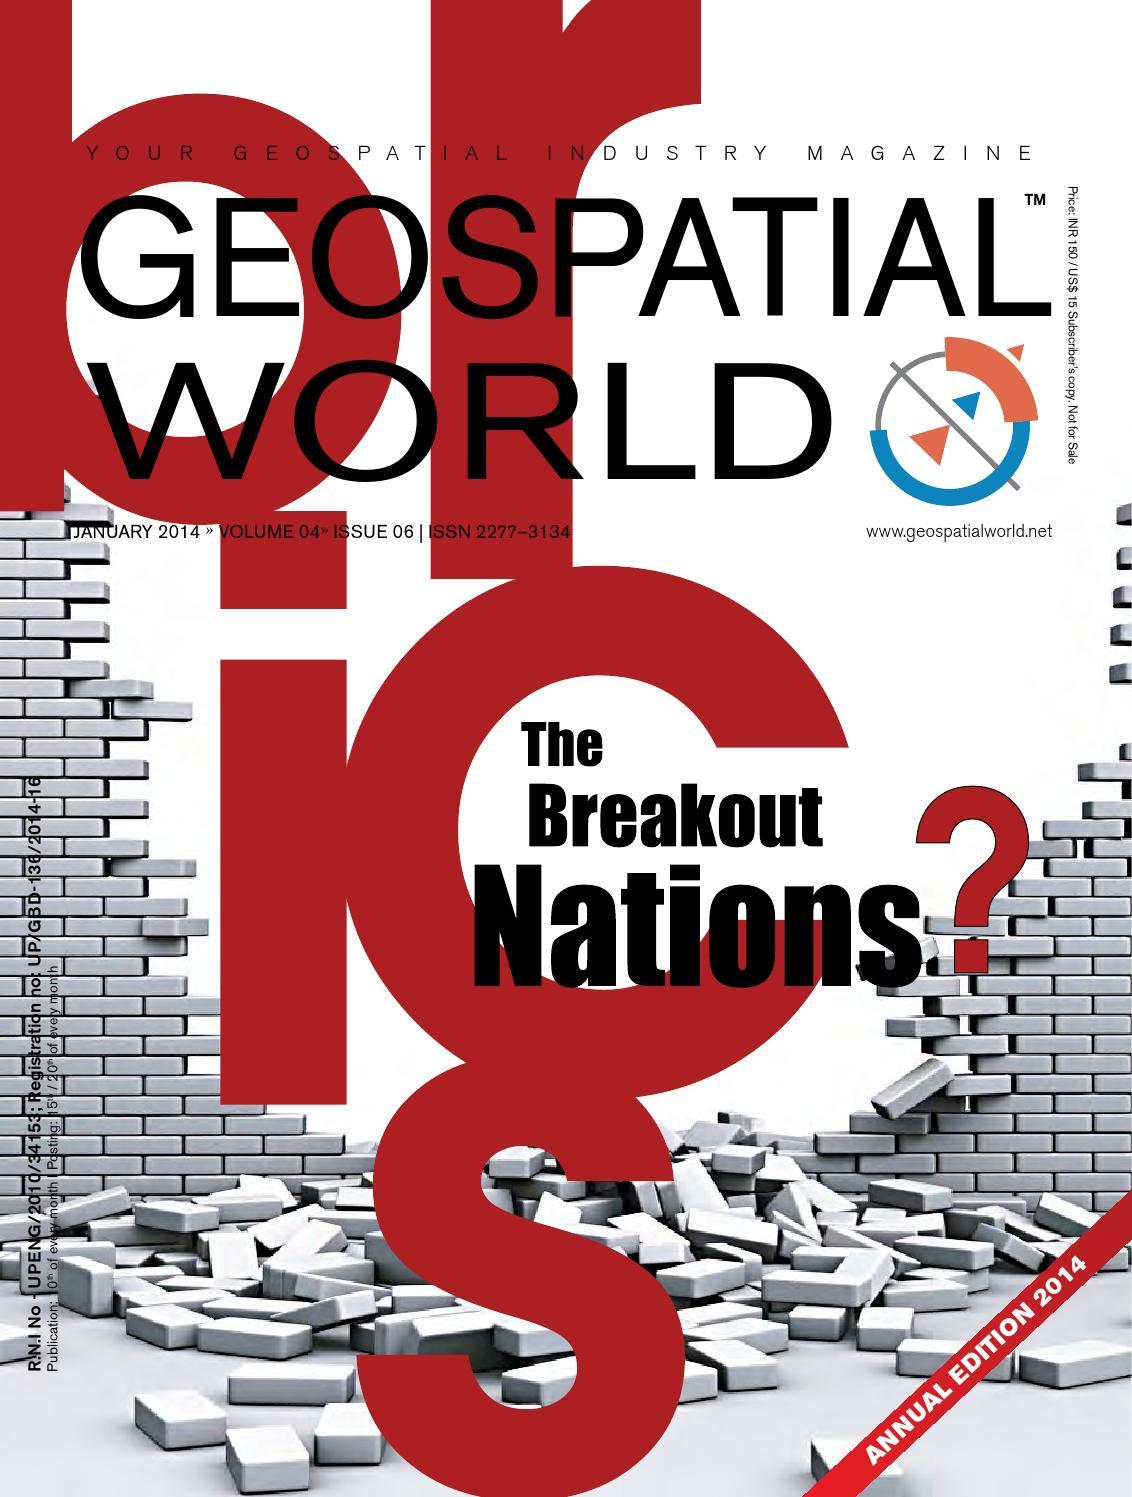 January 2014 Edition by Geospatial Media - issuu